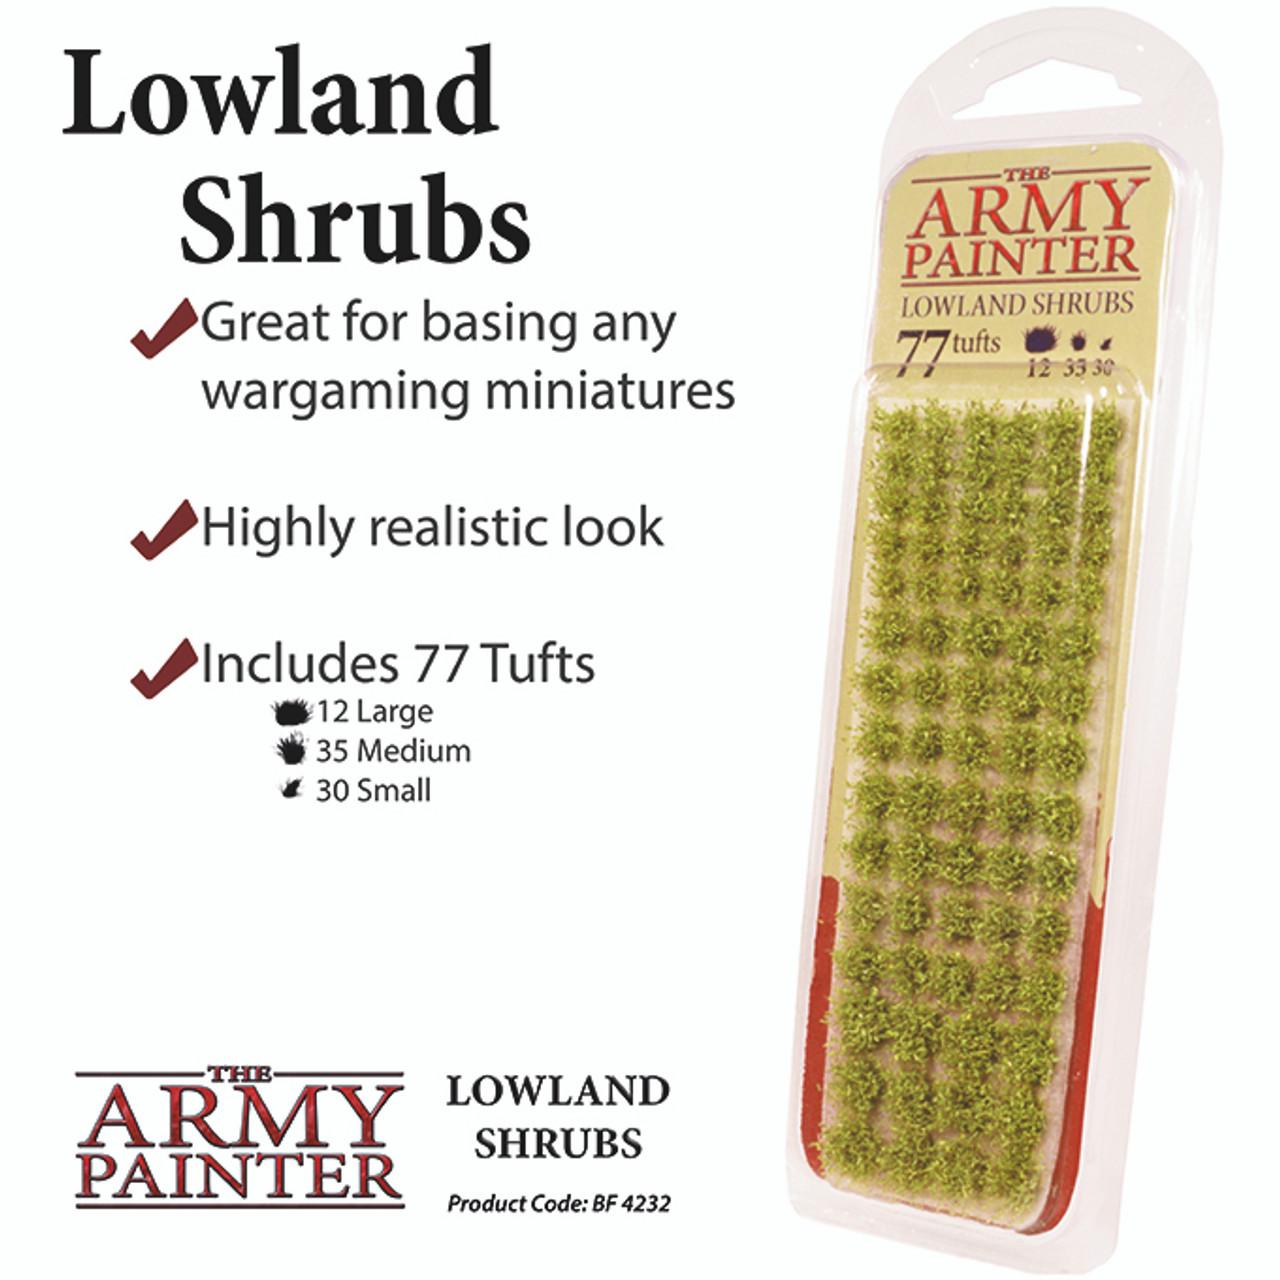 Army Painter Battlefields - Lowland Shrubs